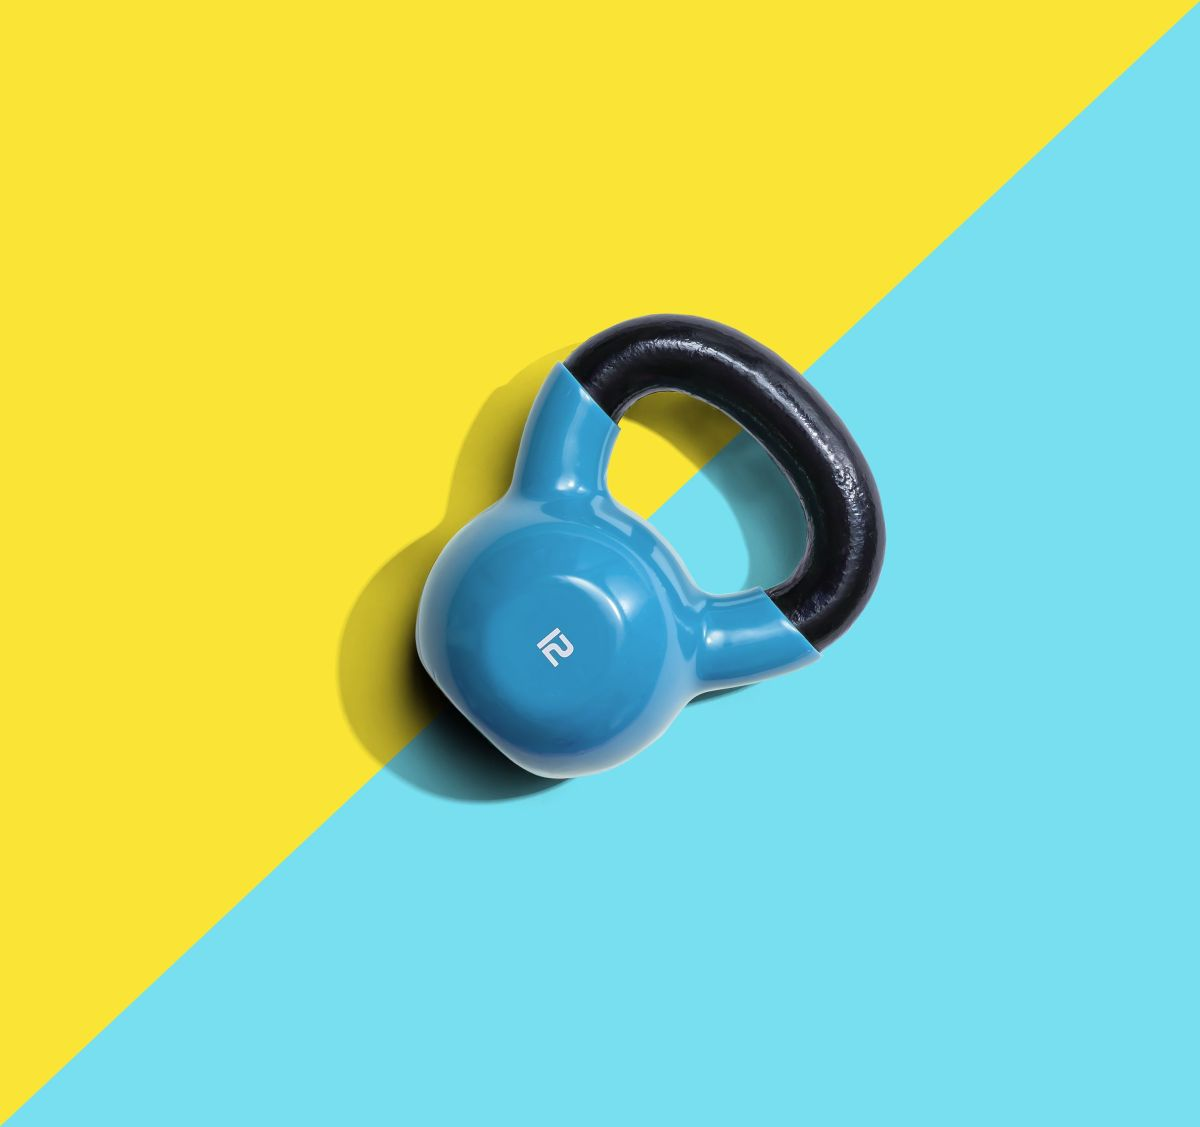 7 Best Kettlebells of 2020 - Kettlebells for Your Home Gym